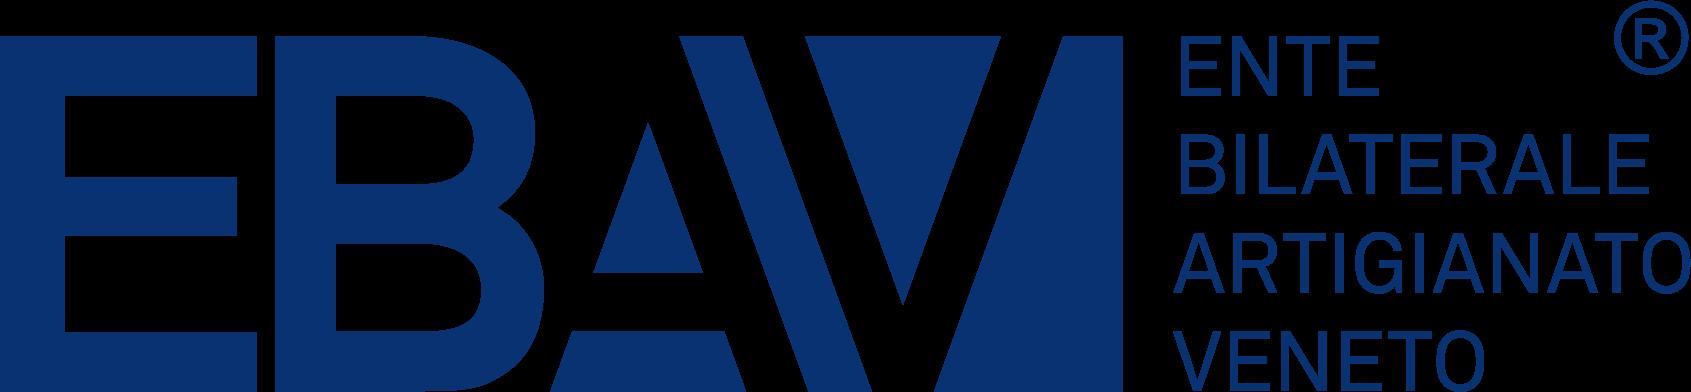 Logo-EBAV-Integrale-trasparente-registrato_600dpi